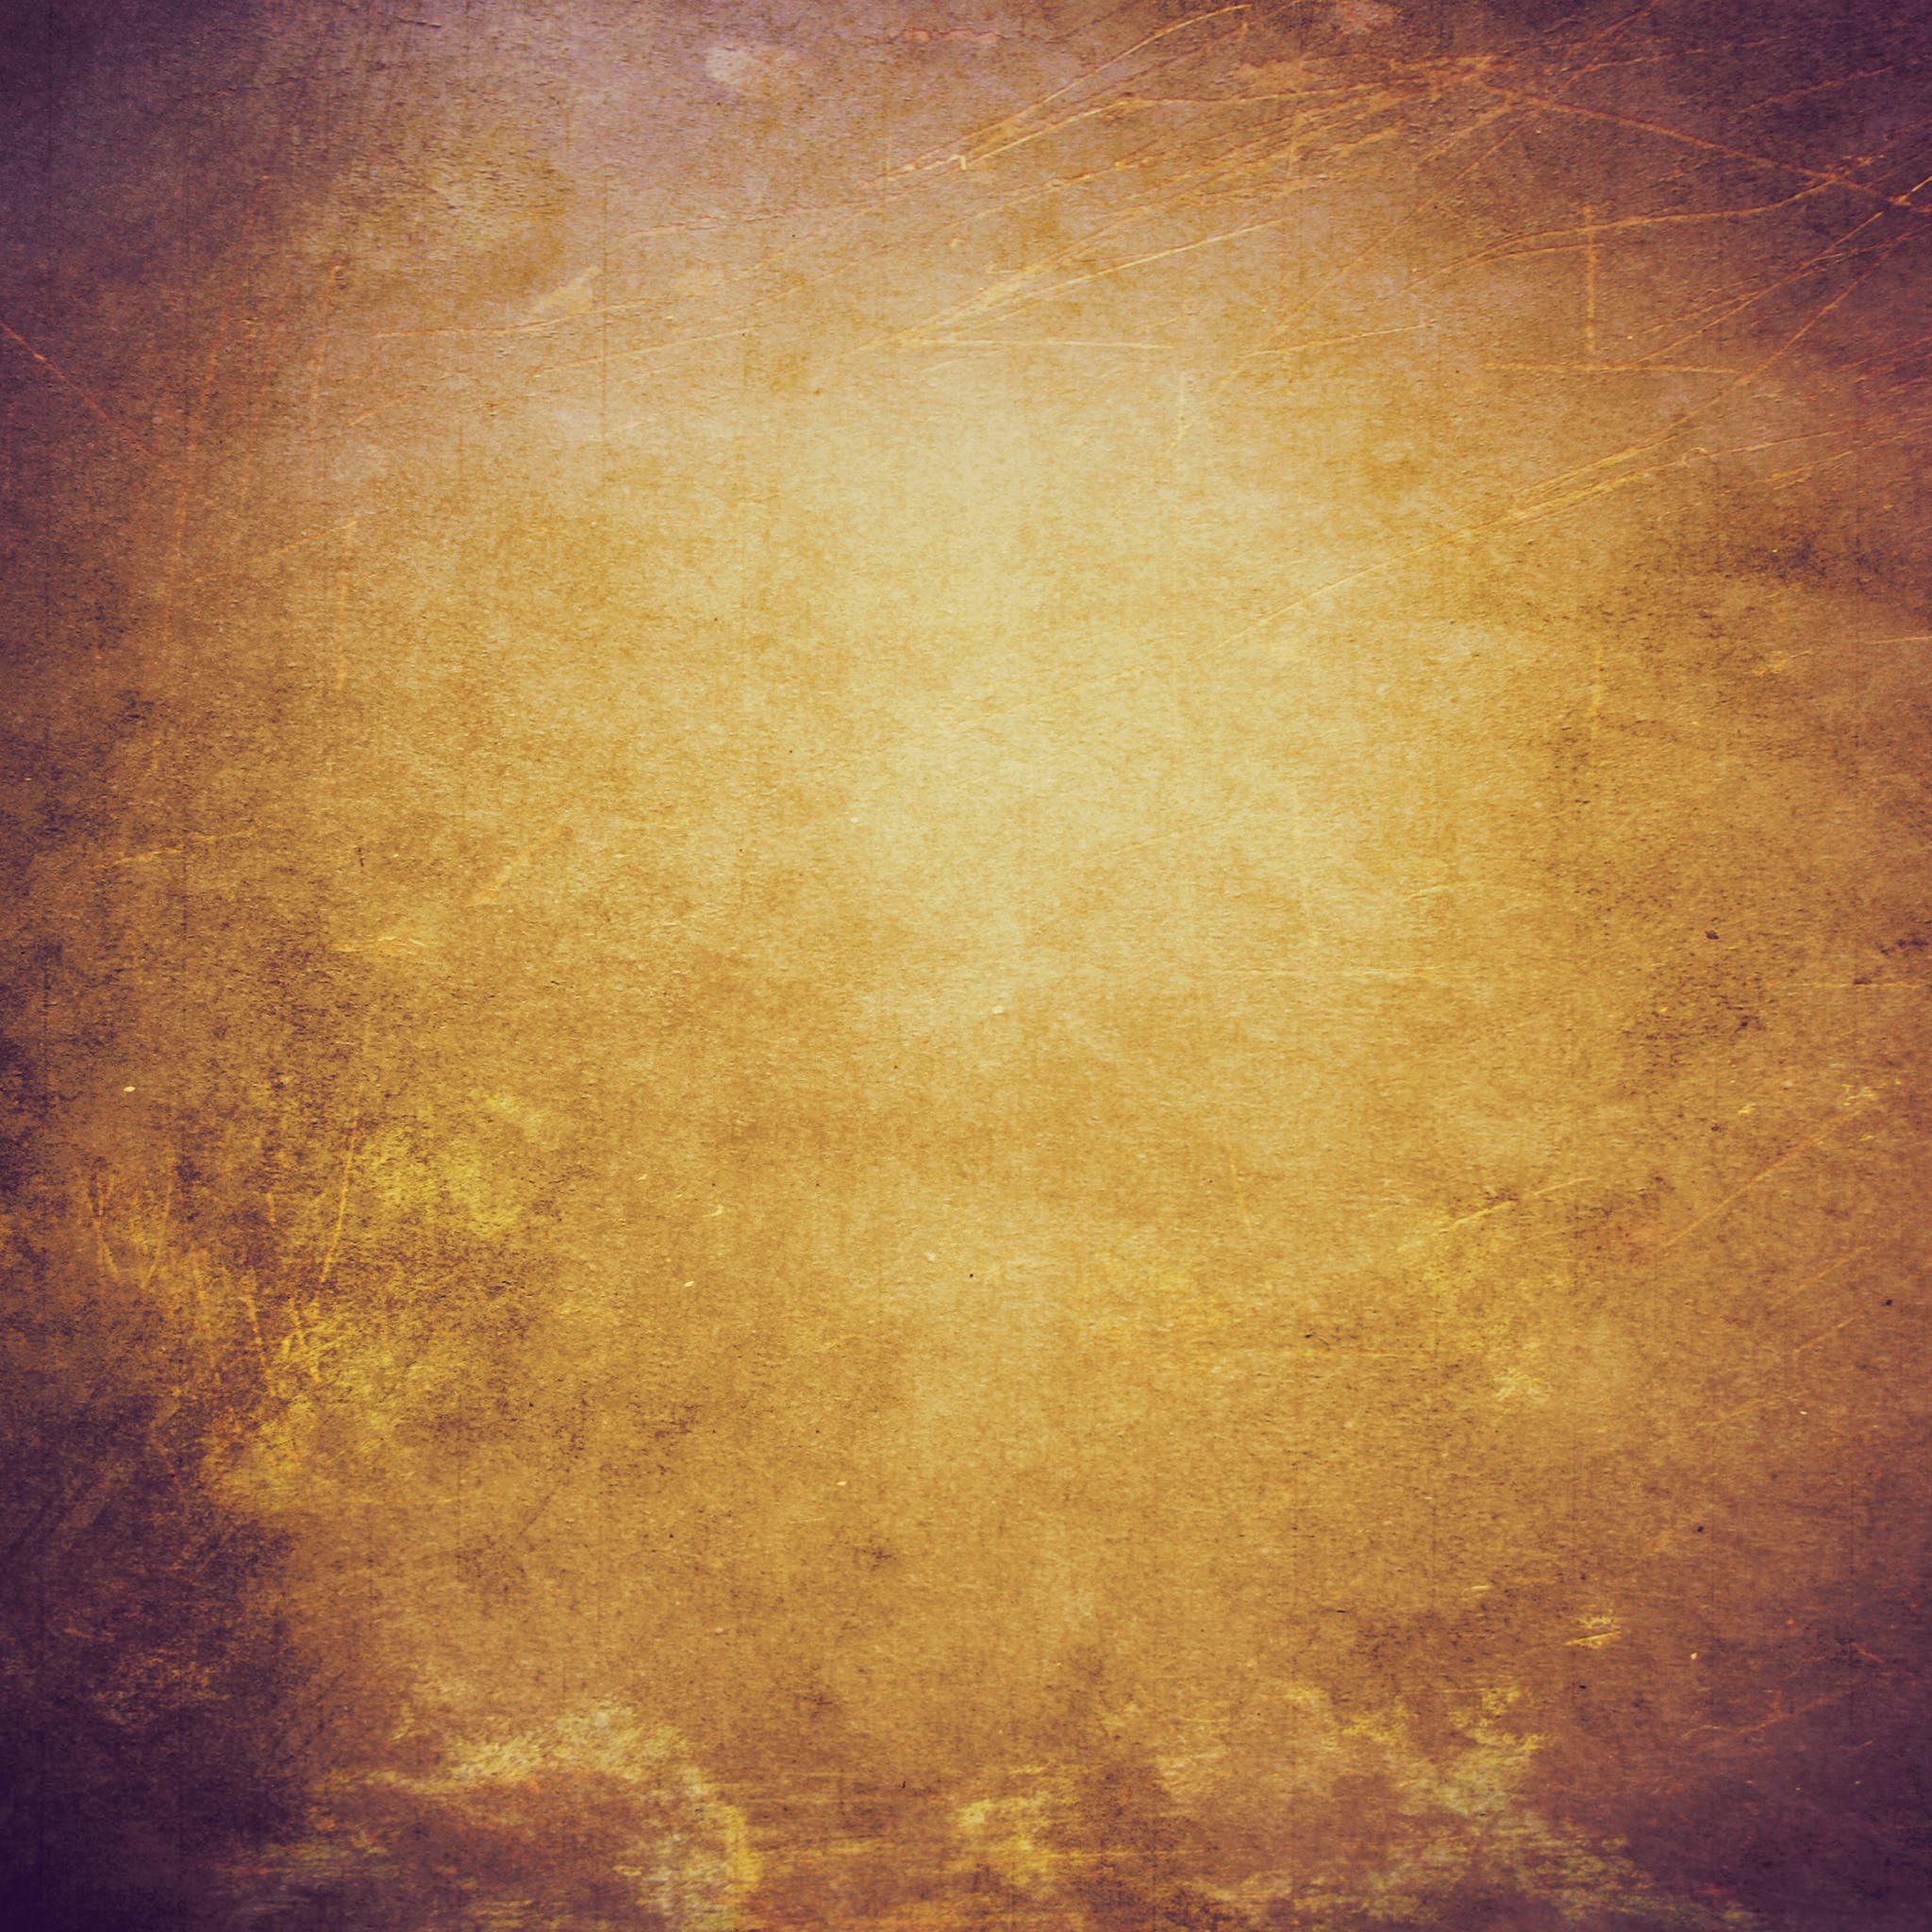 Bob Marley Wallpaper Hd Iphone 6 Wallpaper Weekends Gold Ipad Wallpapers